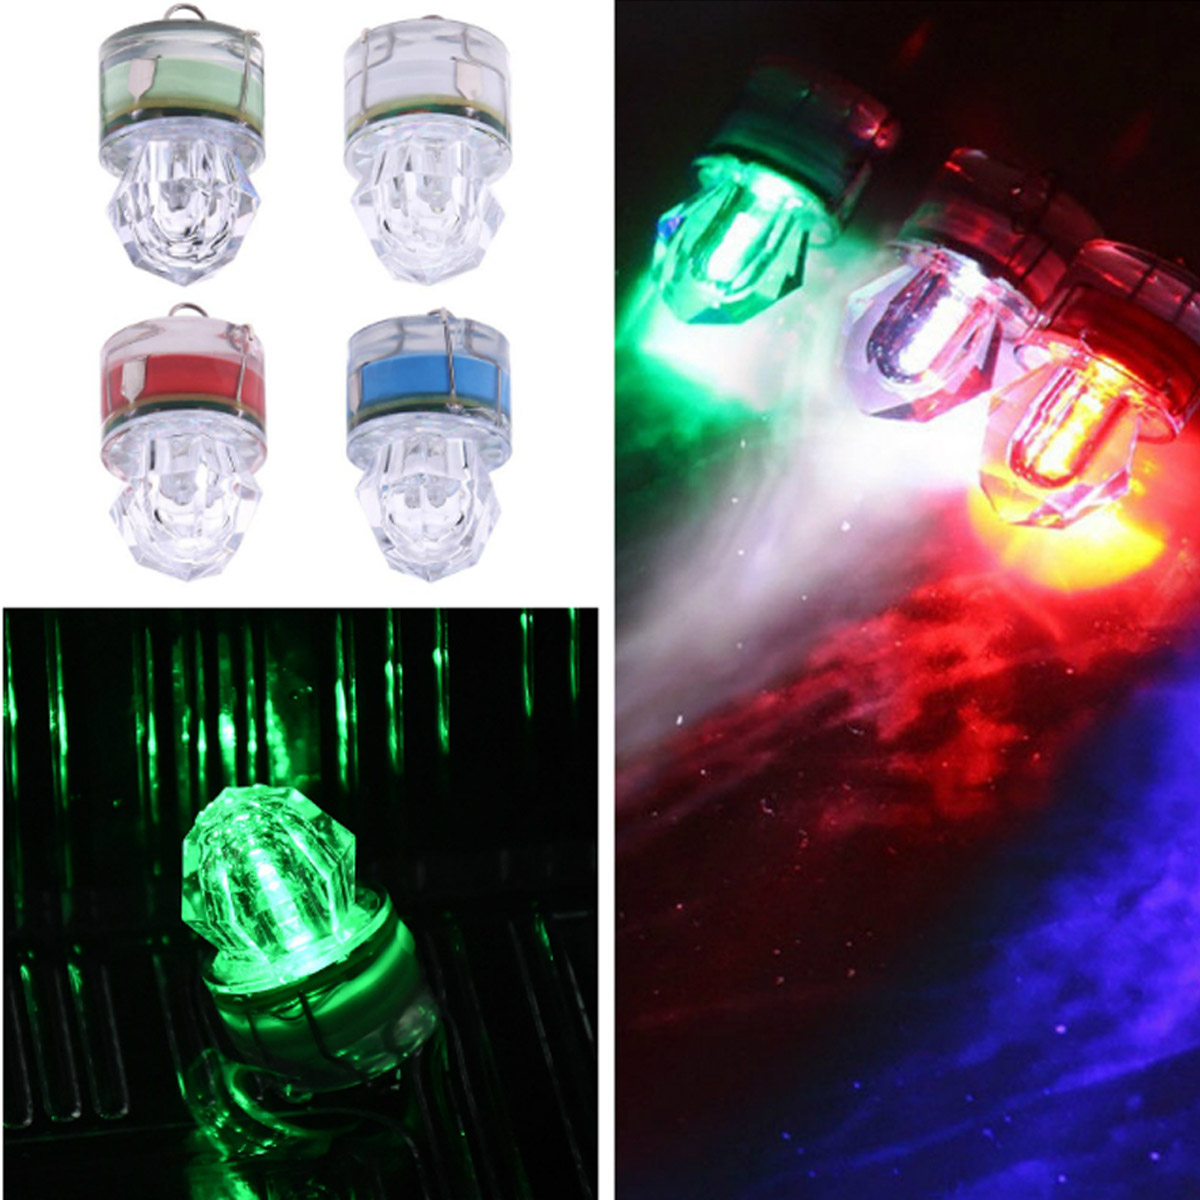 15x  Mini ABS LED Waterproof Fishing Bait Light Squid Fishing Lures Bait Deep Drop Diamond Underwater Fish Lure Lamp Lights Lamp